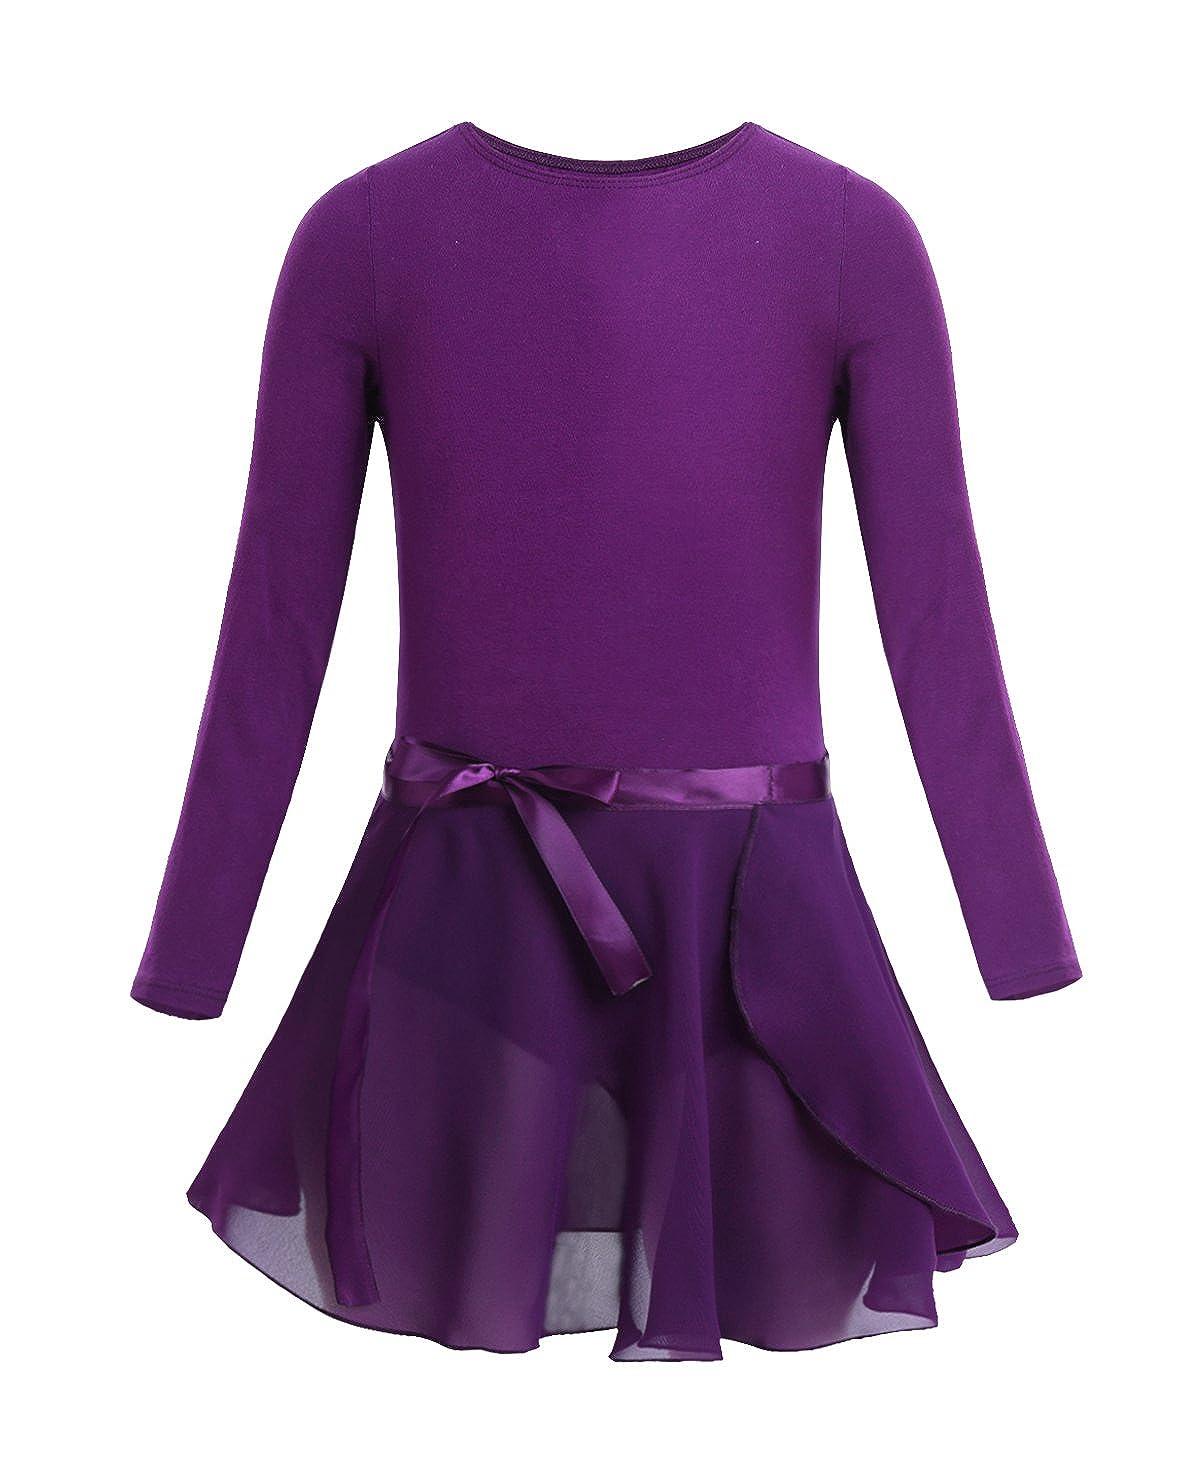 Agoky Girls Ballerina Ballet Dance Gymnastics Gym Leotard Tutu Dress